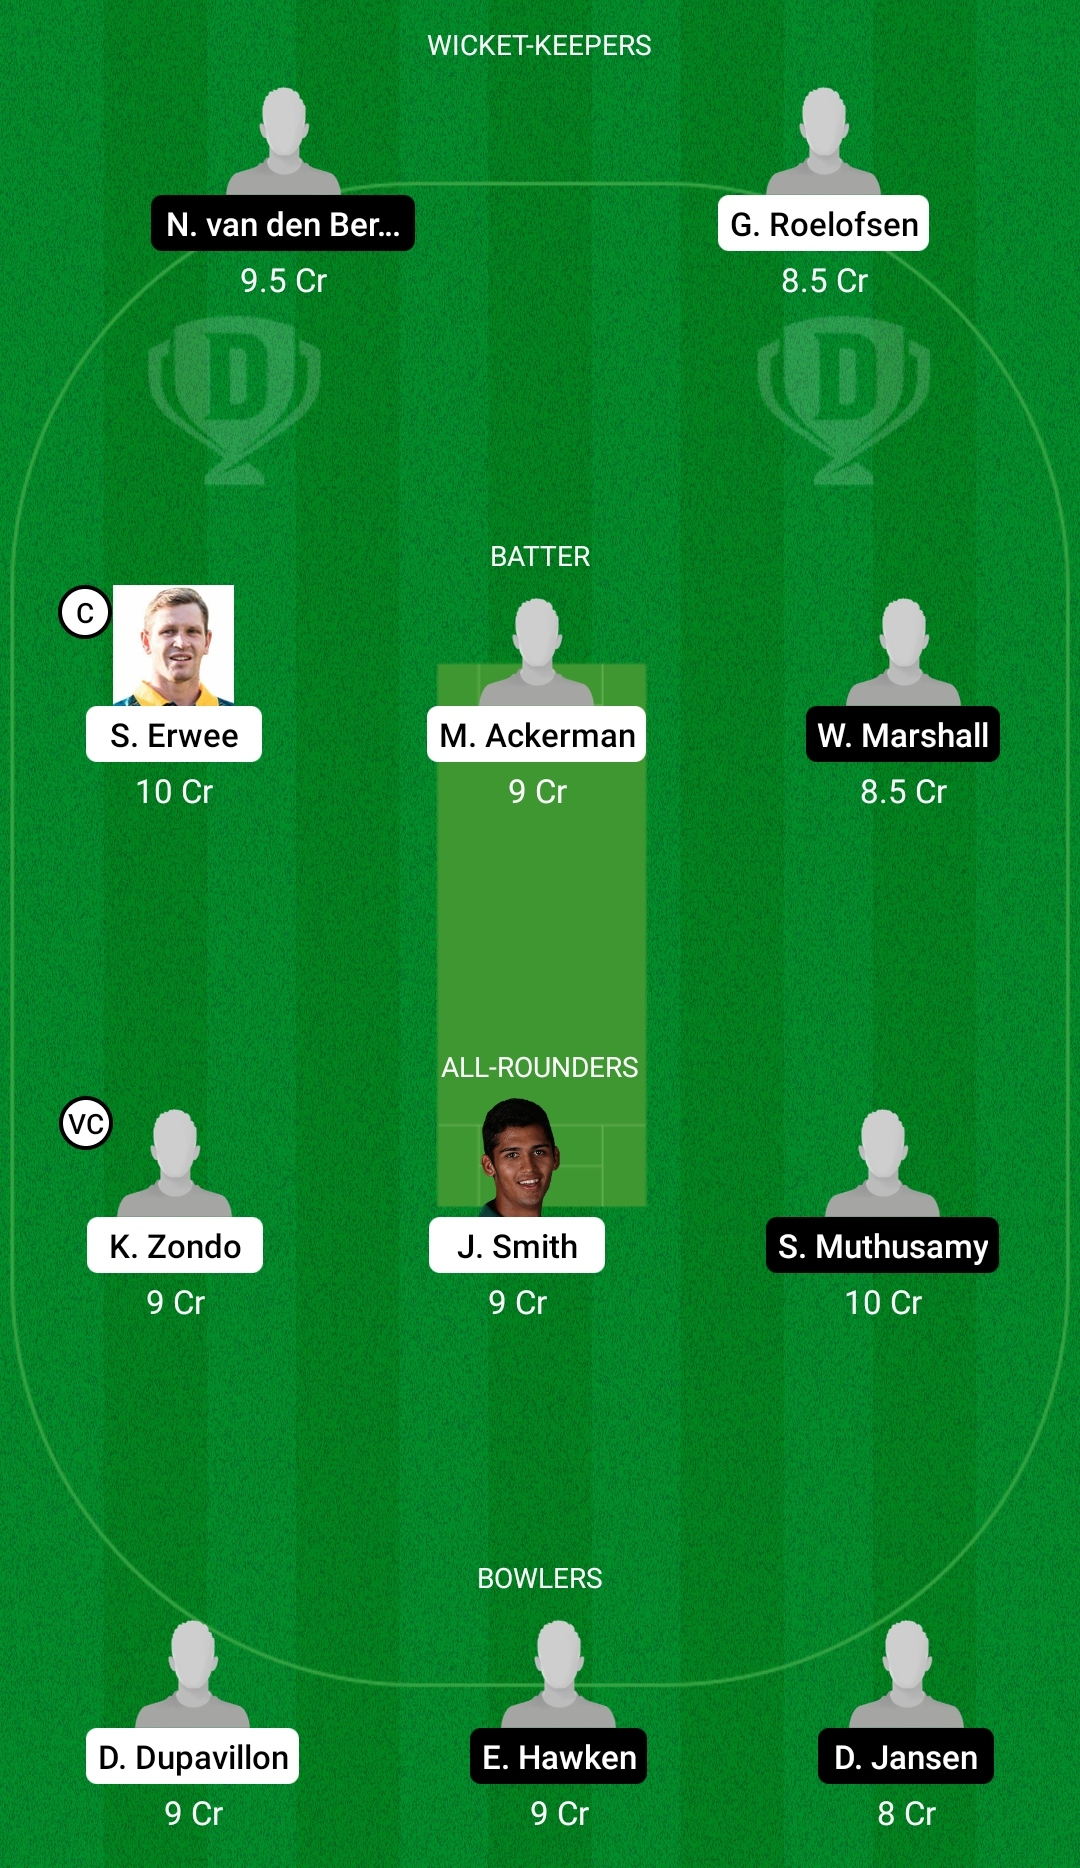 डीओएल बनाम एनडब्ल्यूडी ड्रीम11 भविष्यवाणी काल्पनिक क्रिकेट टिप्स ड्रीम11 टीम सीएसए टी20 कप